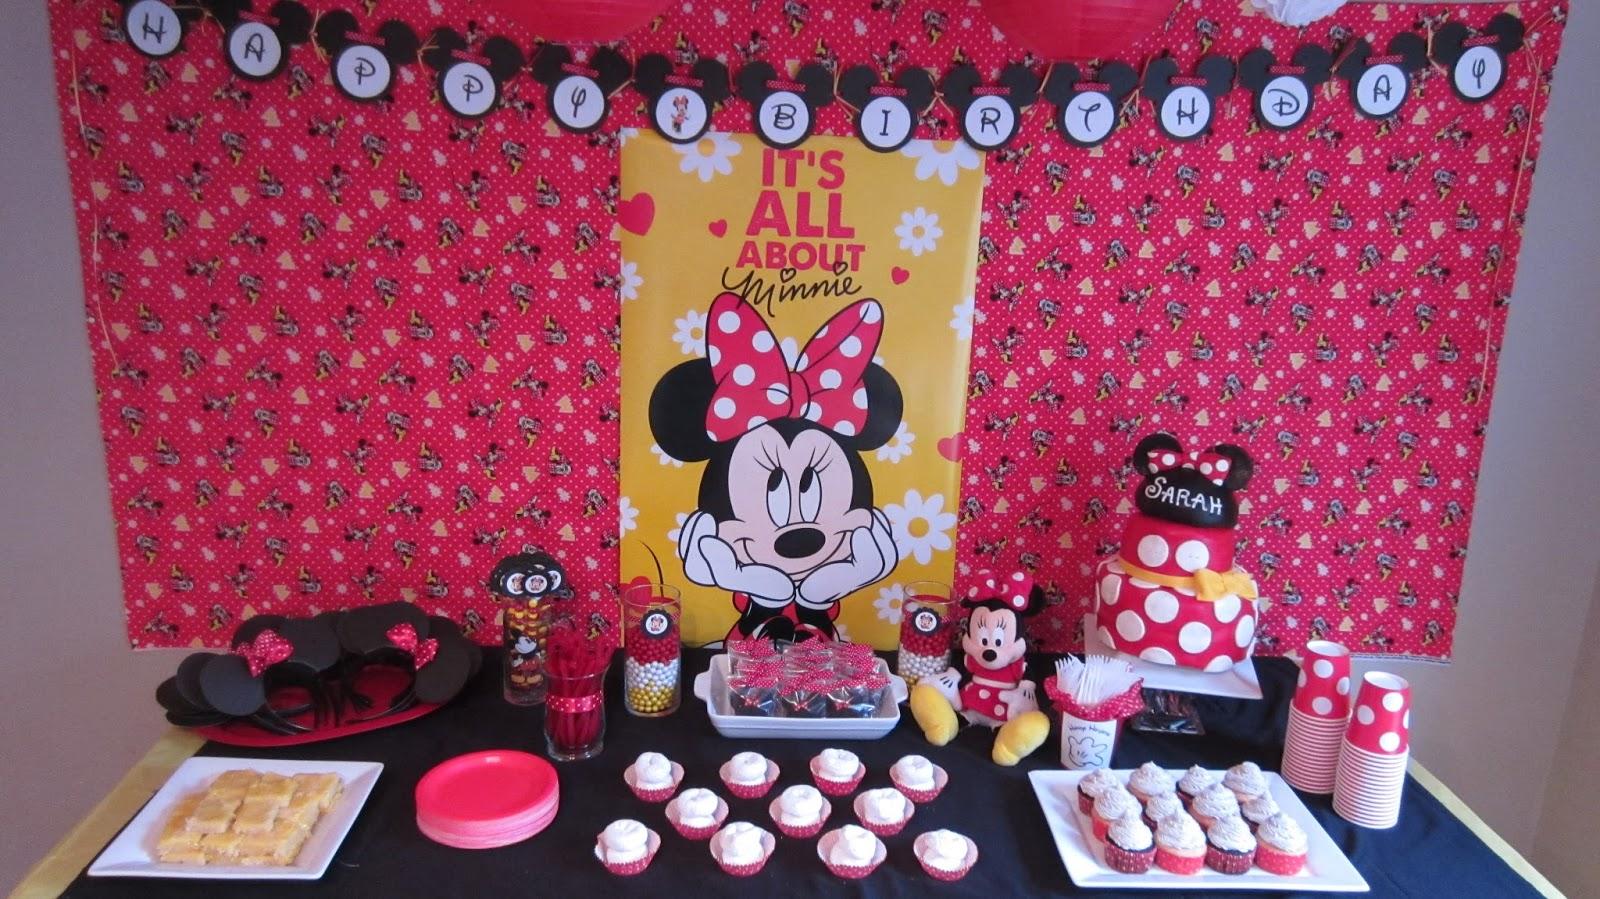 Sarahs Minnie Mouse Birthday Party